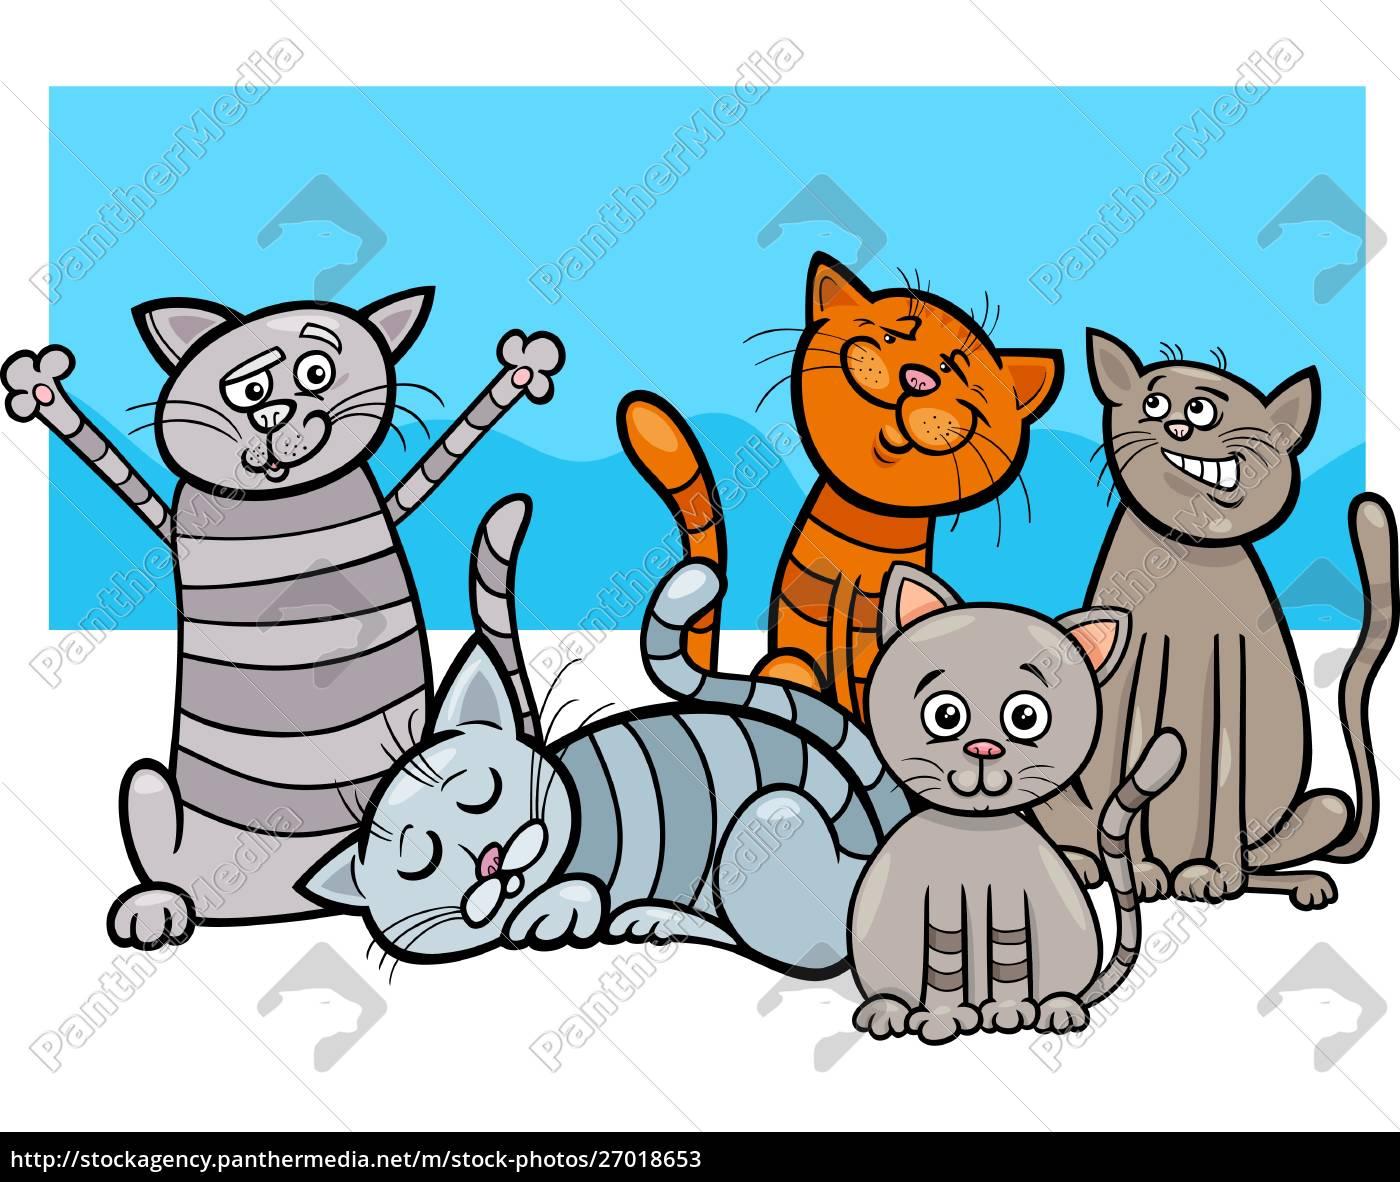 lustige katzen gruppe cartoon illustration - lizenzfreies